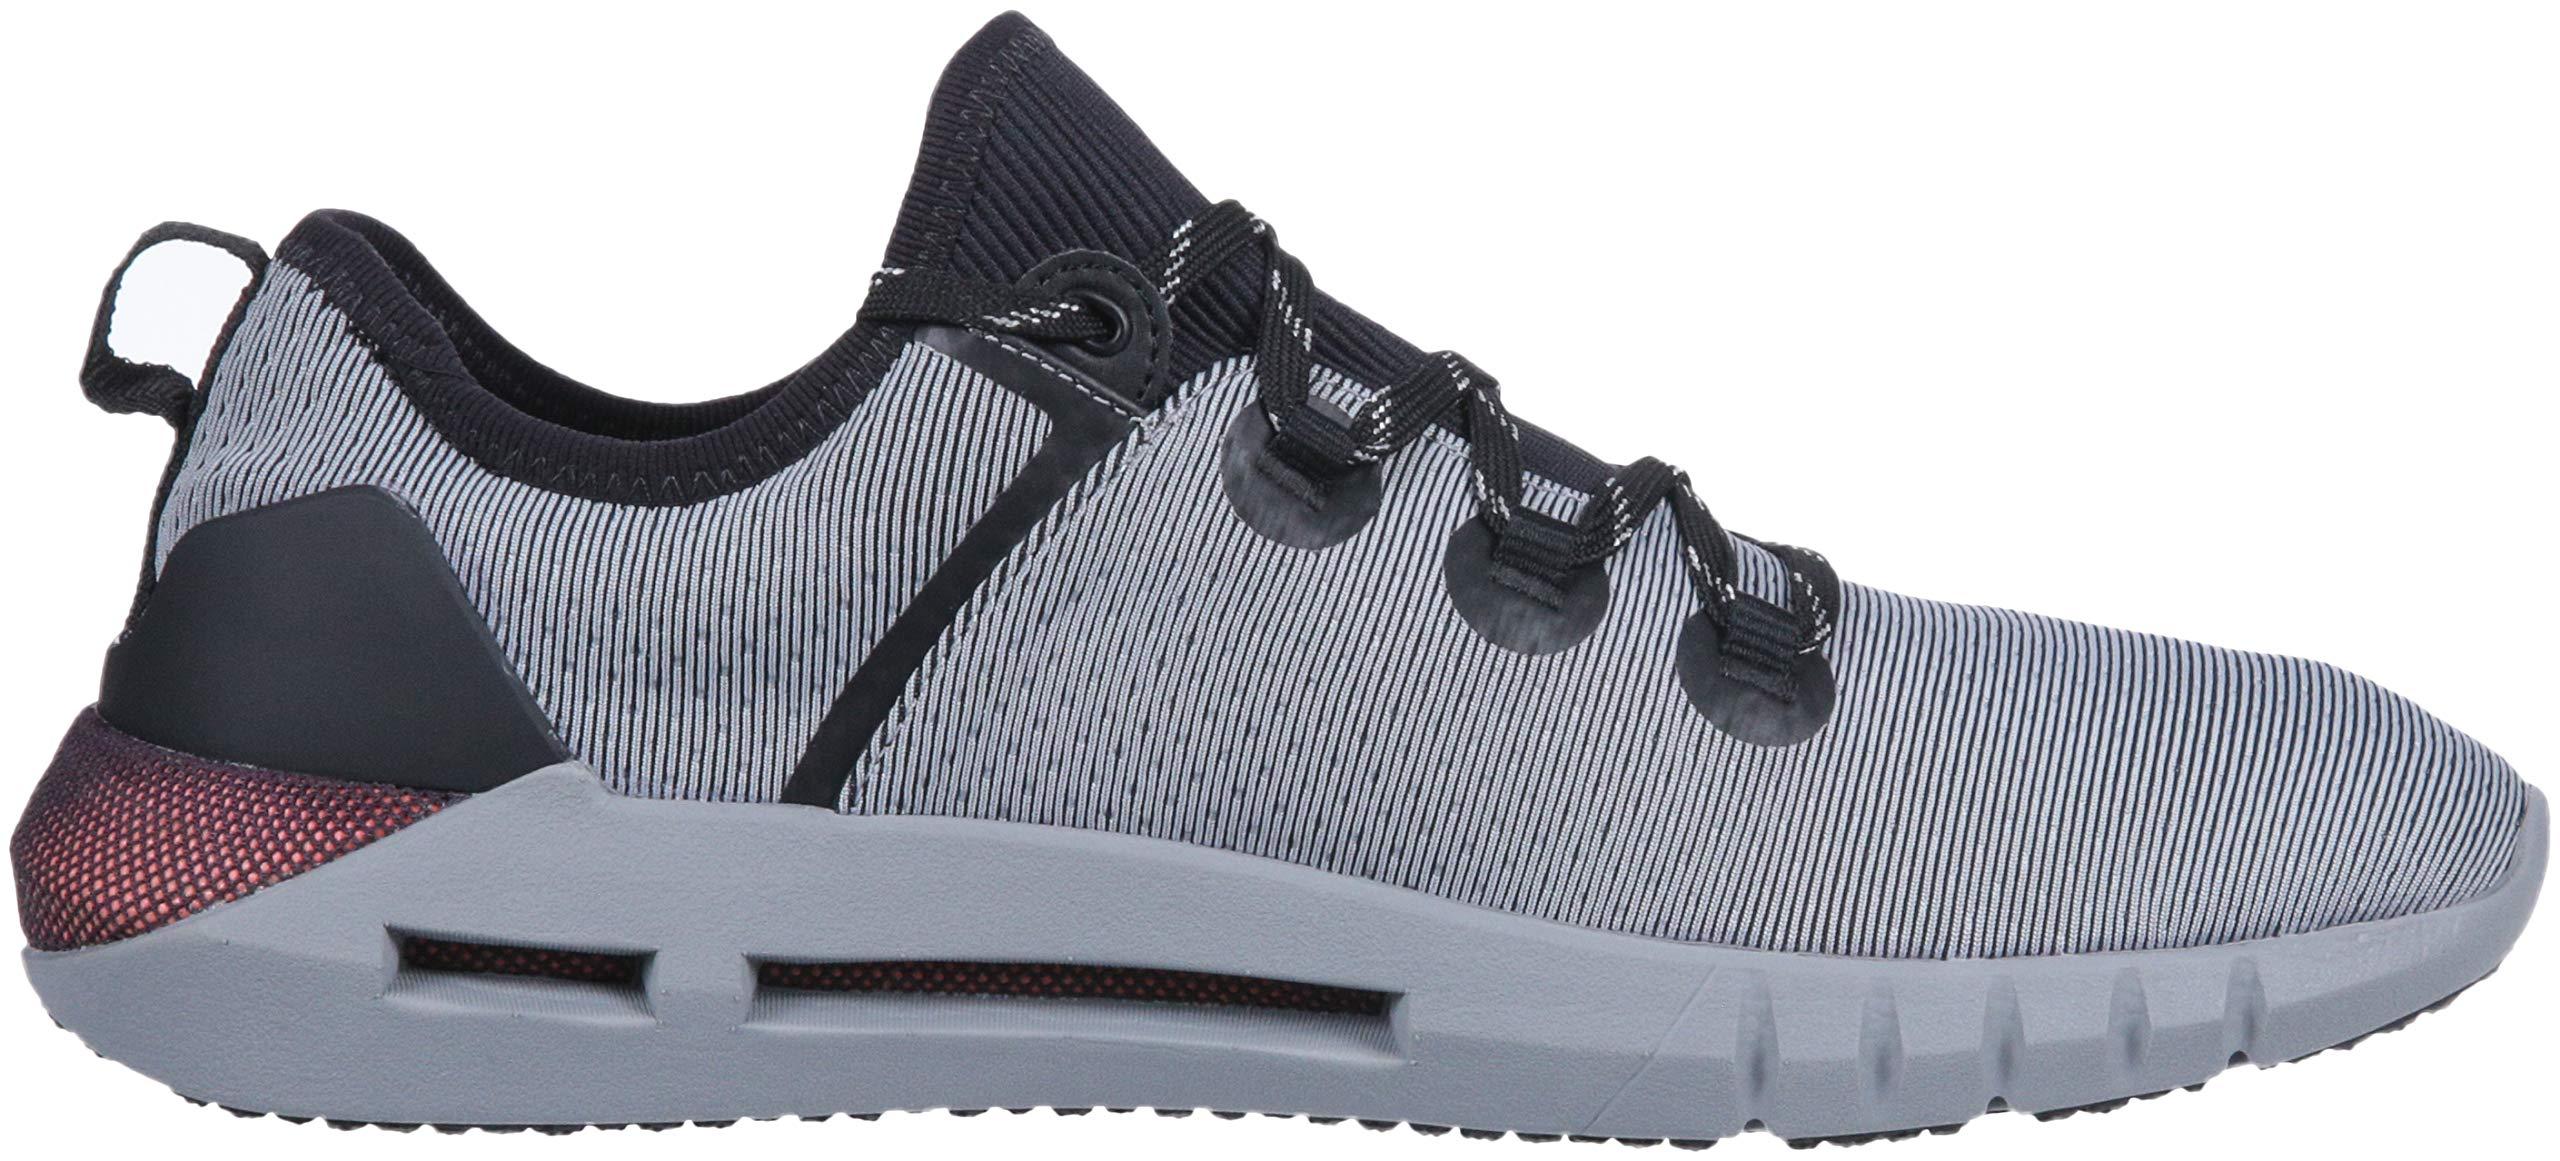 adidas Men's Questar BYD Running Shoe Black/Grey, 6.5 M US by adidas (Image #7)